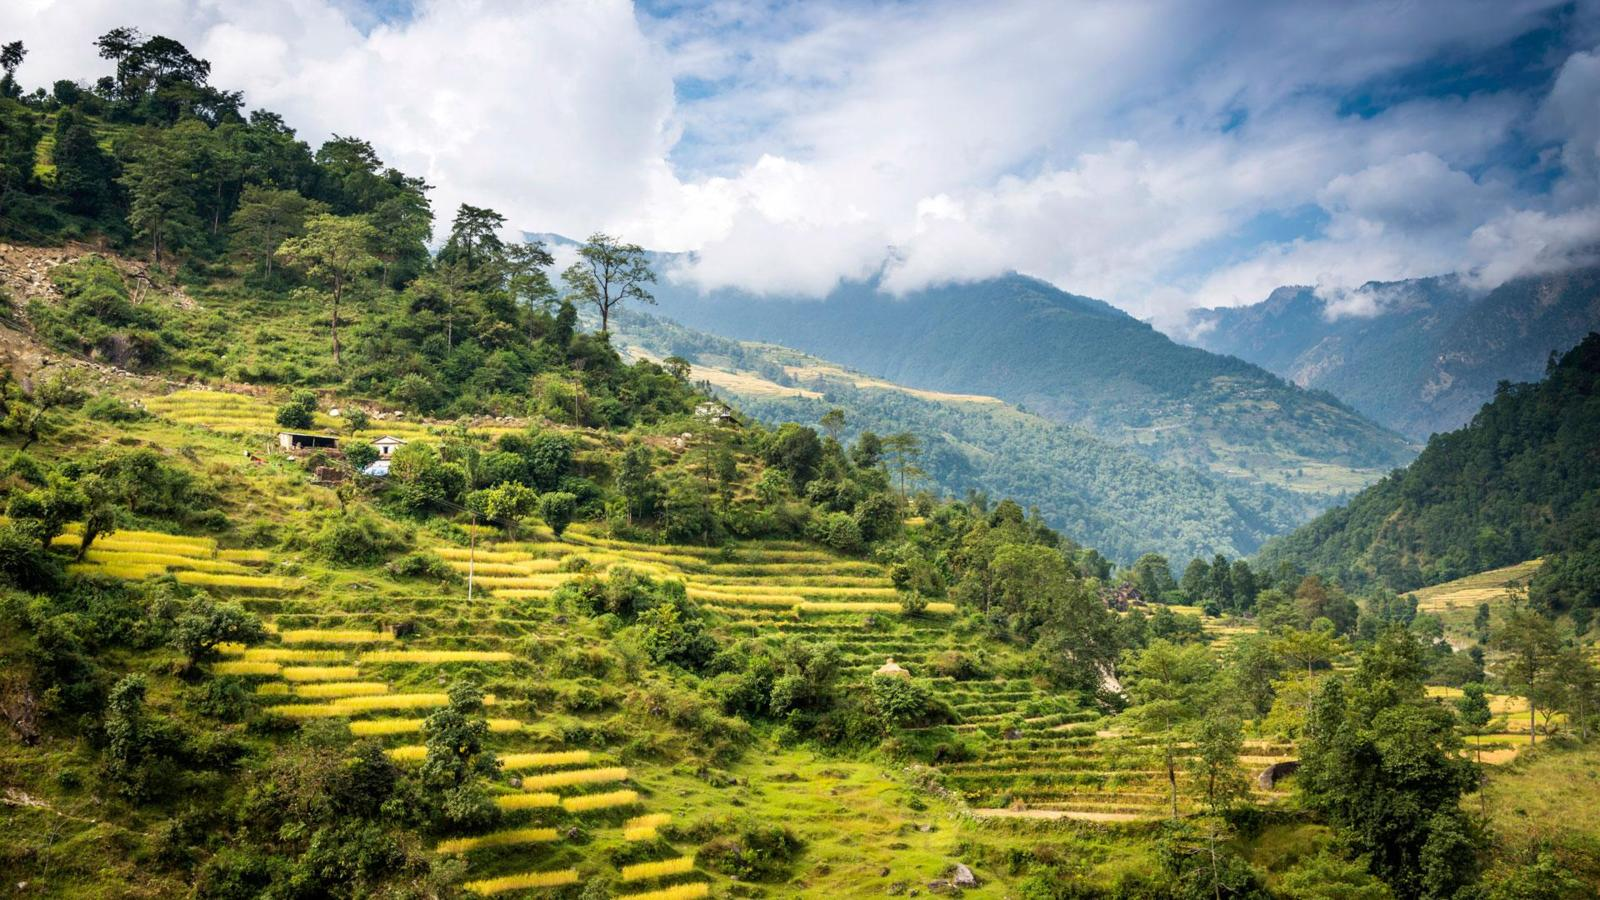 NEPAL - La strada da Kathmandu a Pokhara